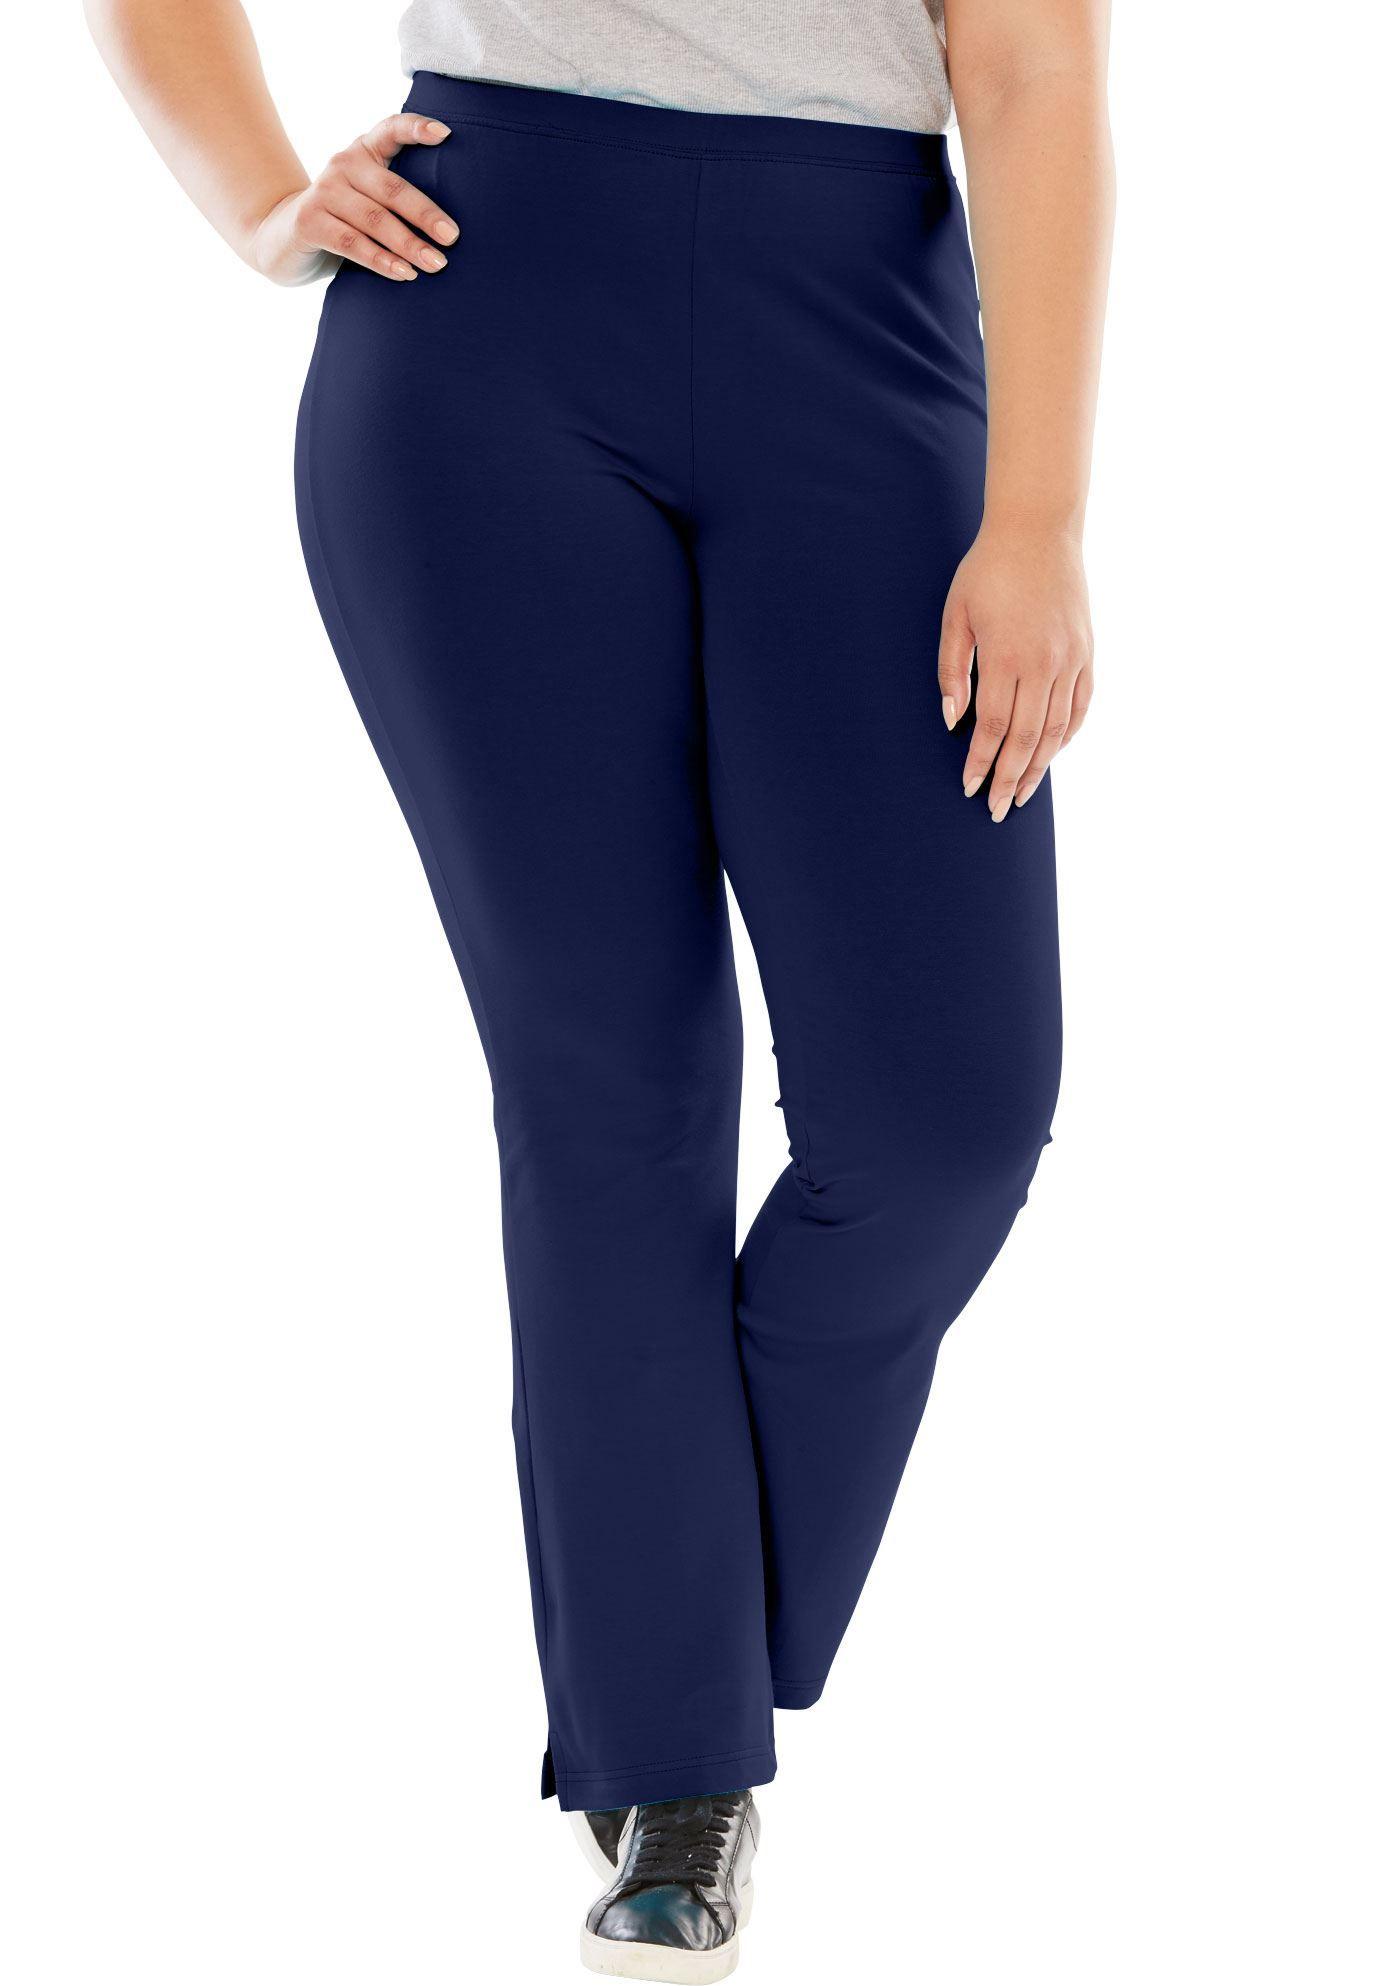 a2bb1ebddef26 Stretch Cotton Bootcut Yoga Pant - Women's Plus Size Clothing ...